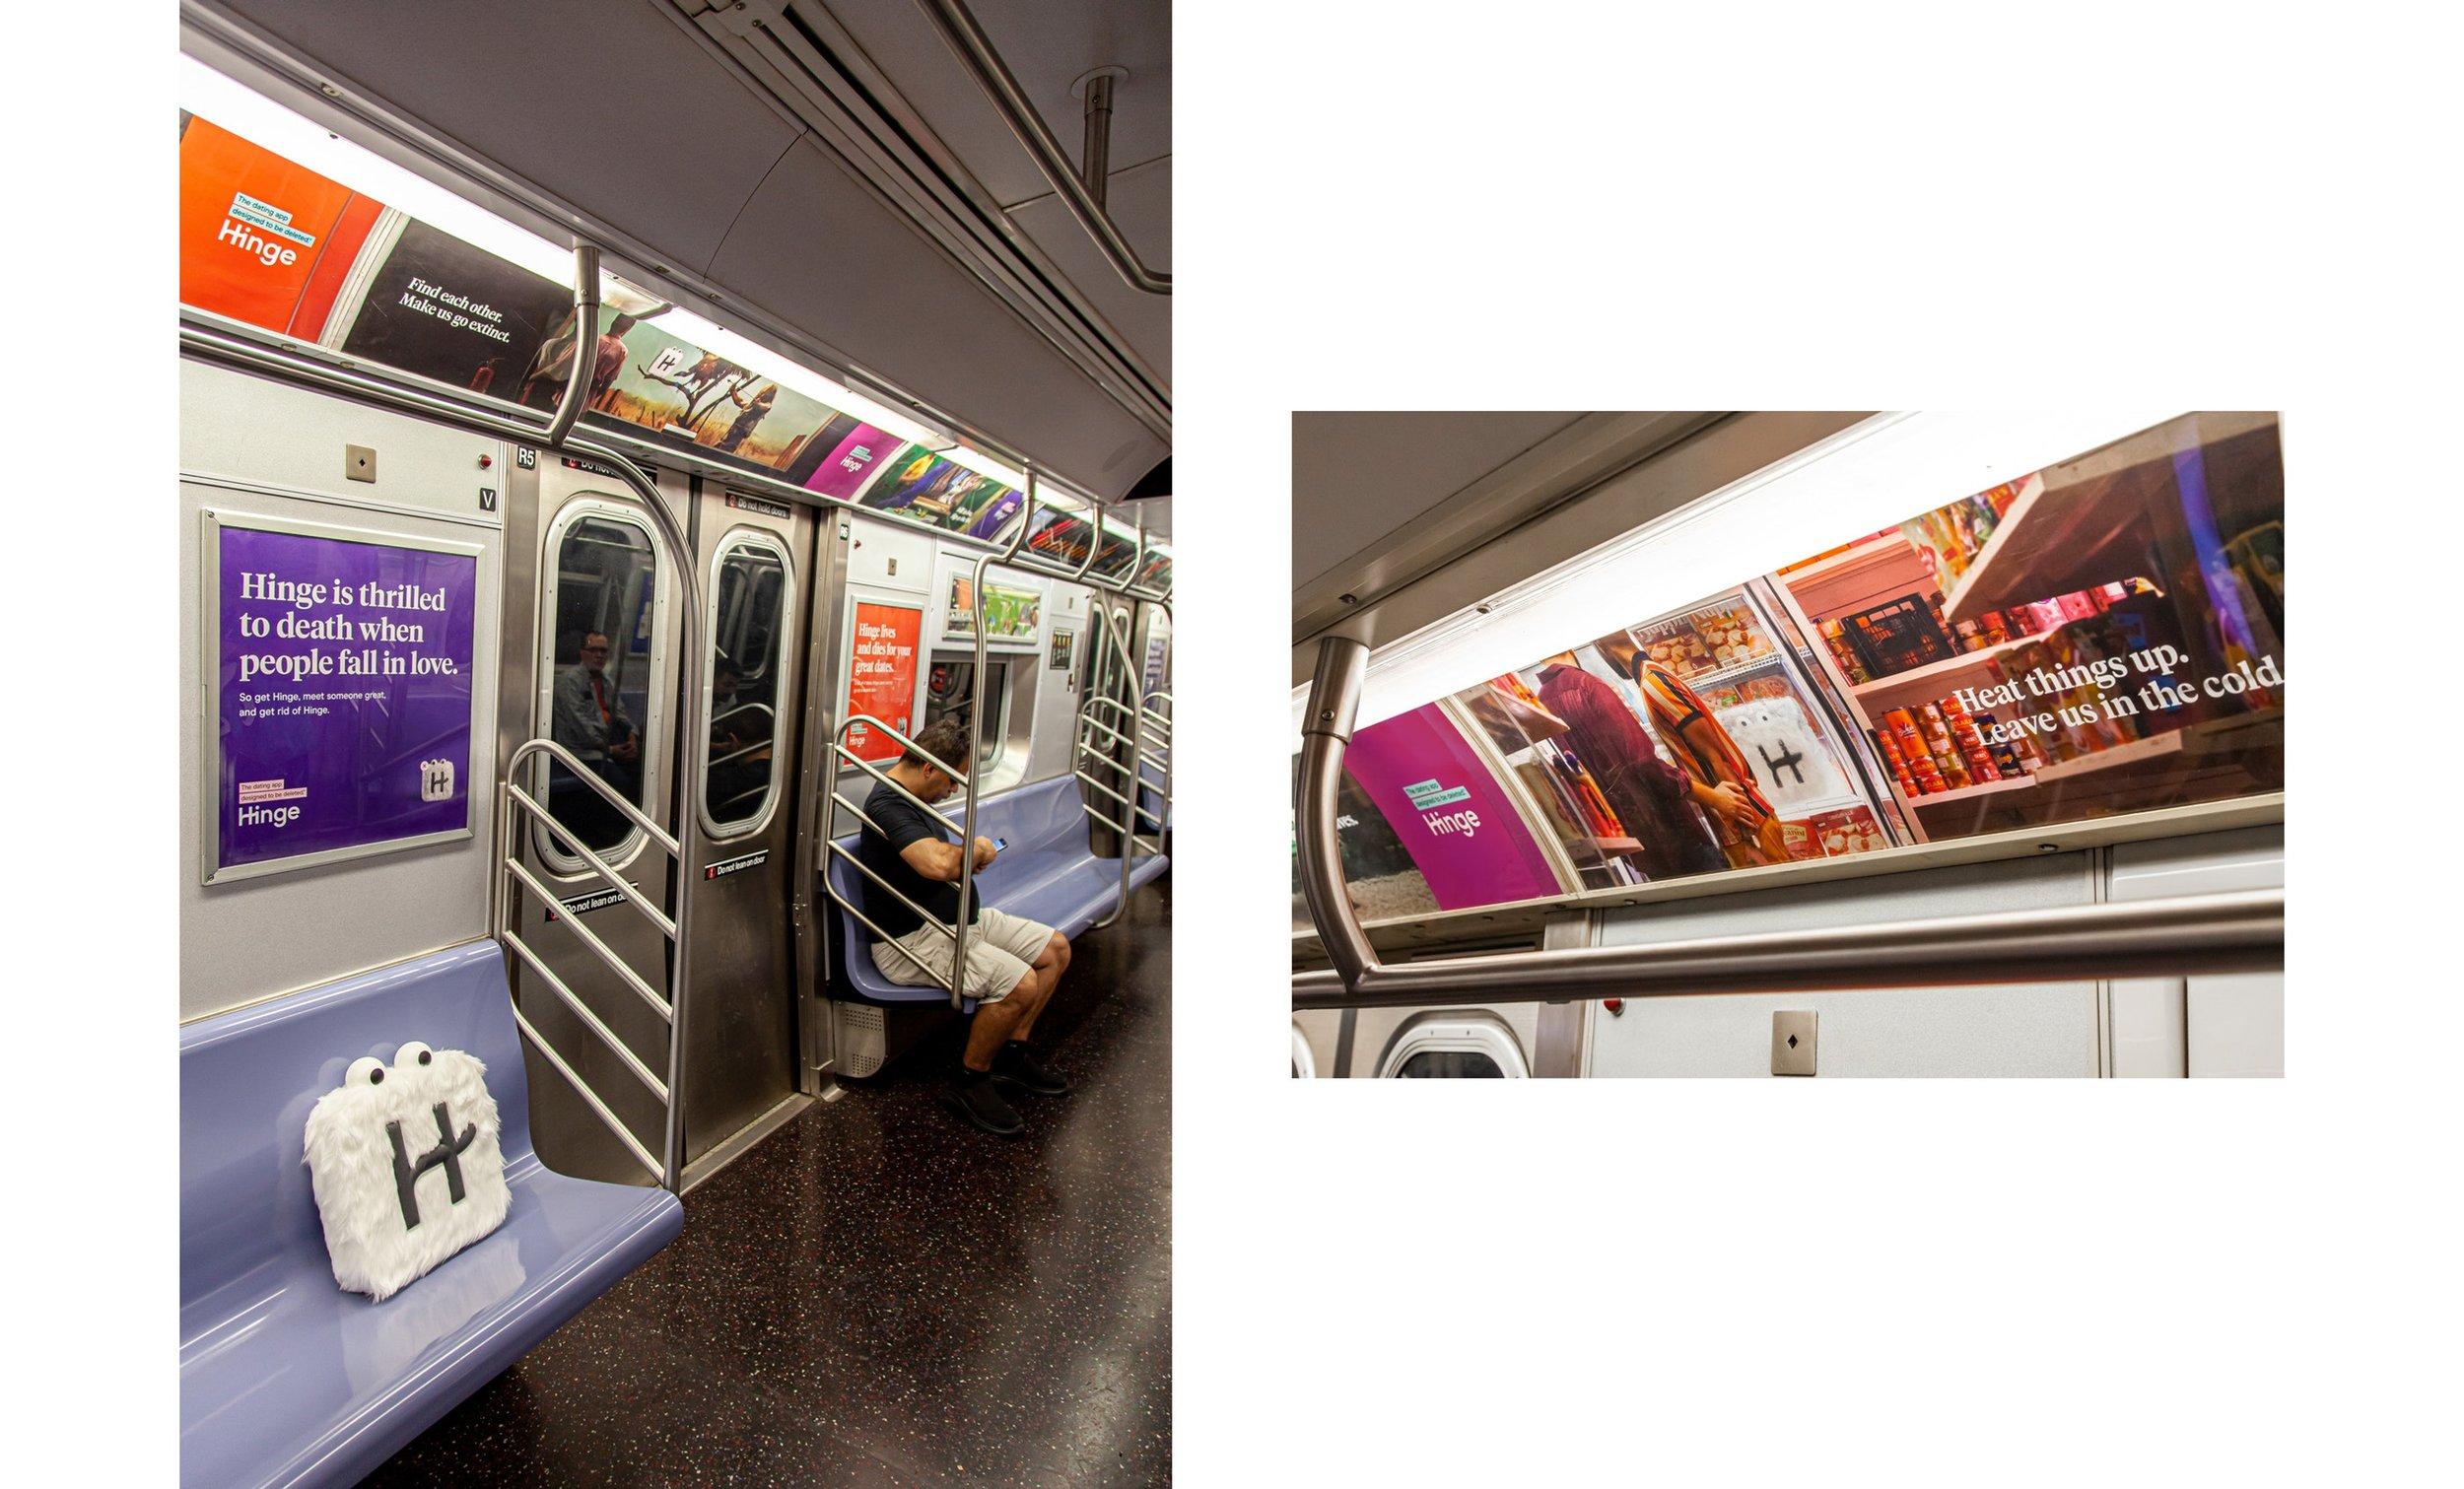 Hinge-Campaign-OOH-Subway-Hingie-Bodega-1.2.jpg